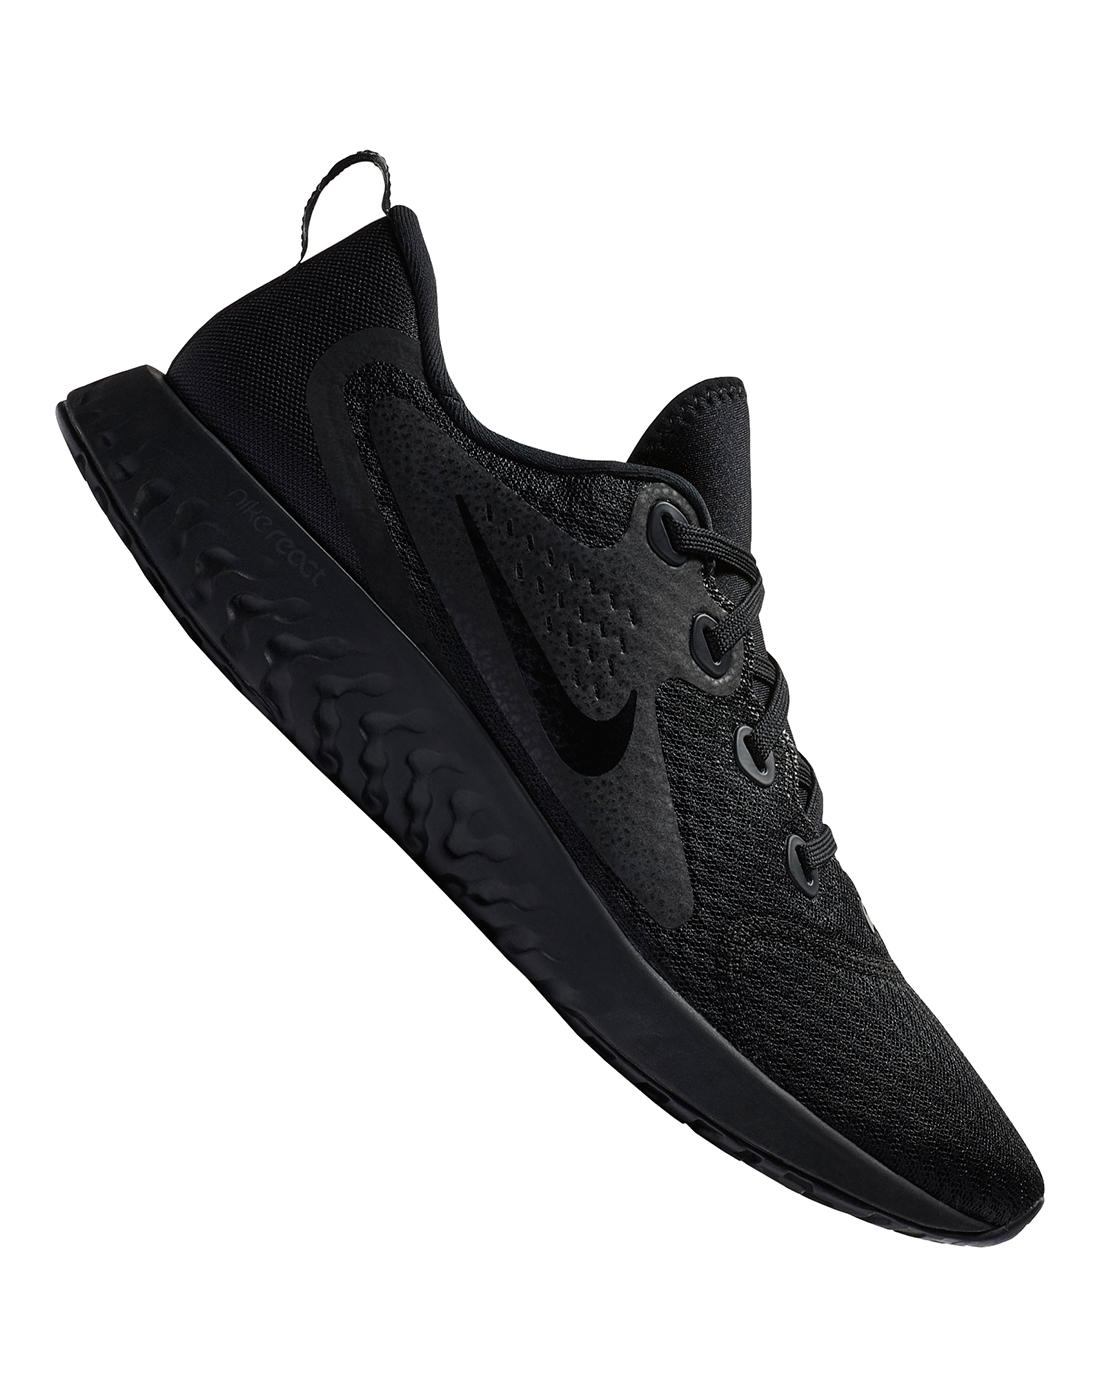 6a948685f565 Men s Black Nike Legend React